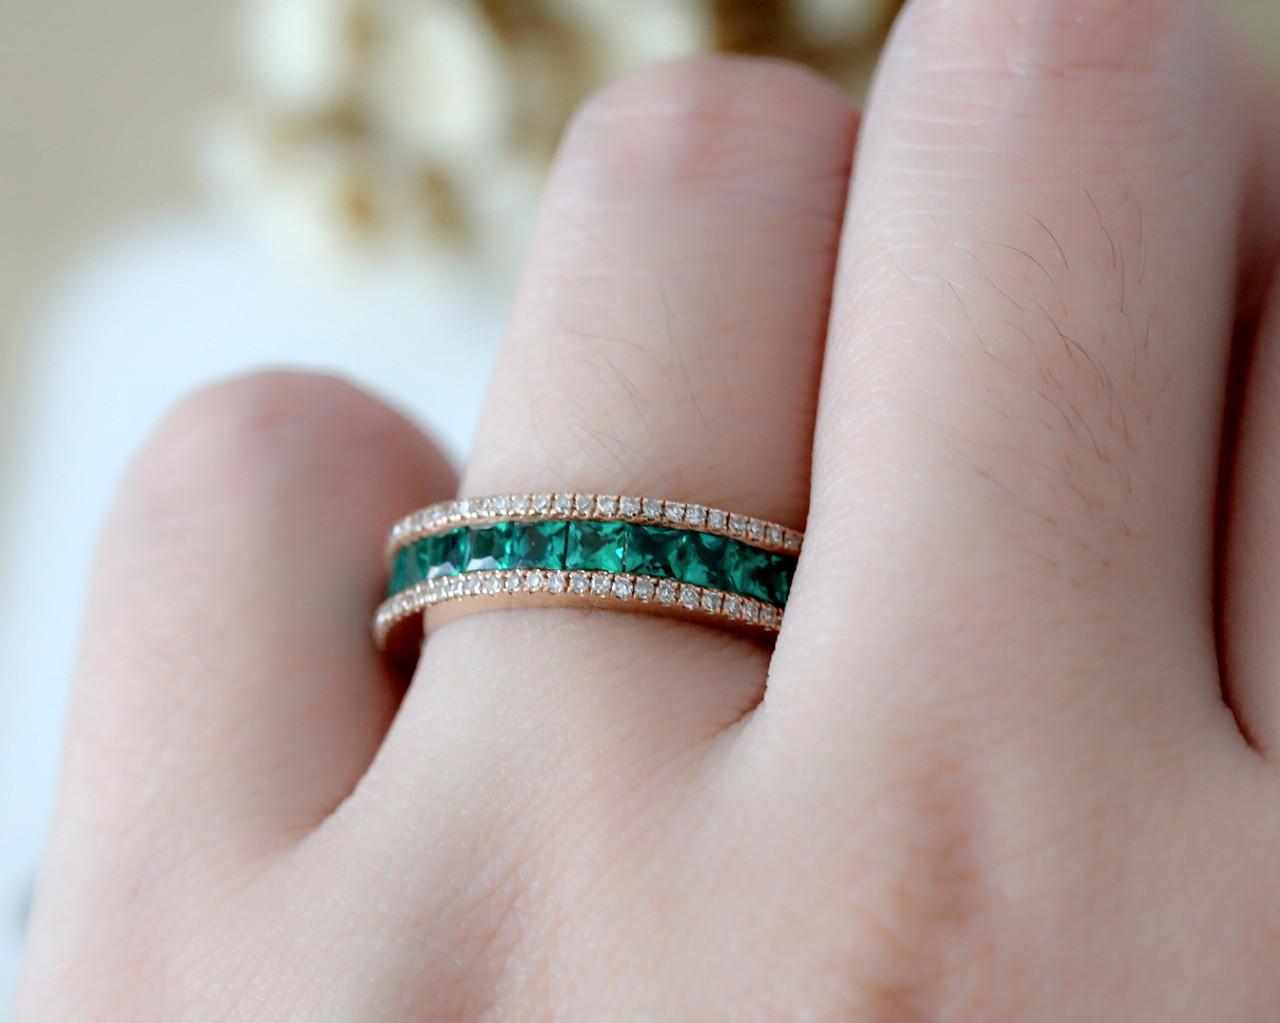 Emerald Wedding Band.Emerald Wedding Band Infinity Rose Gold Women Eternity Stacking Matching Bridal Anniversary Ring Unisex Ring